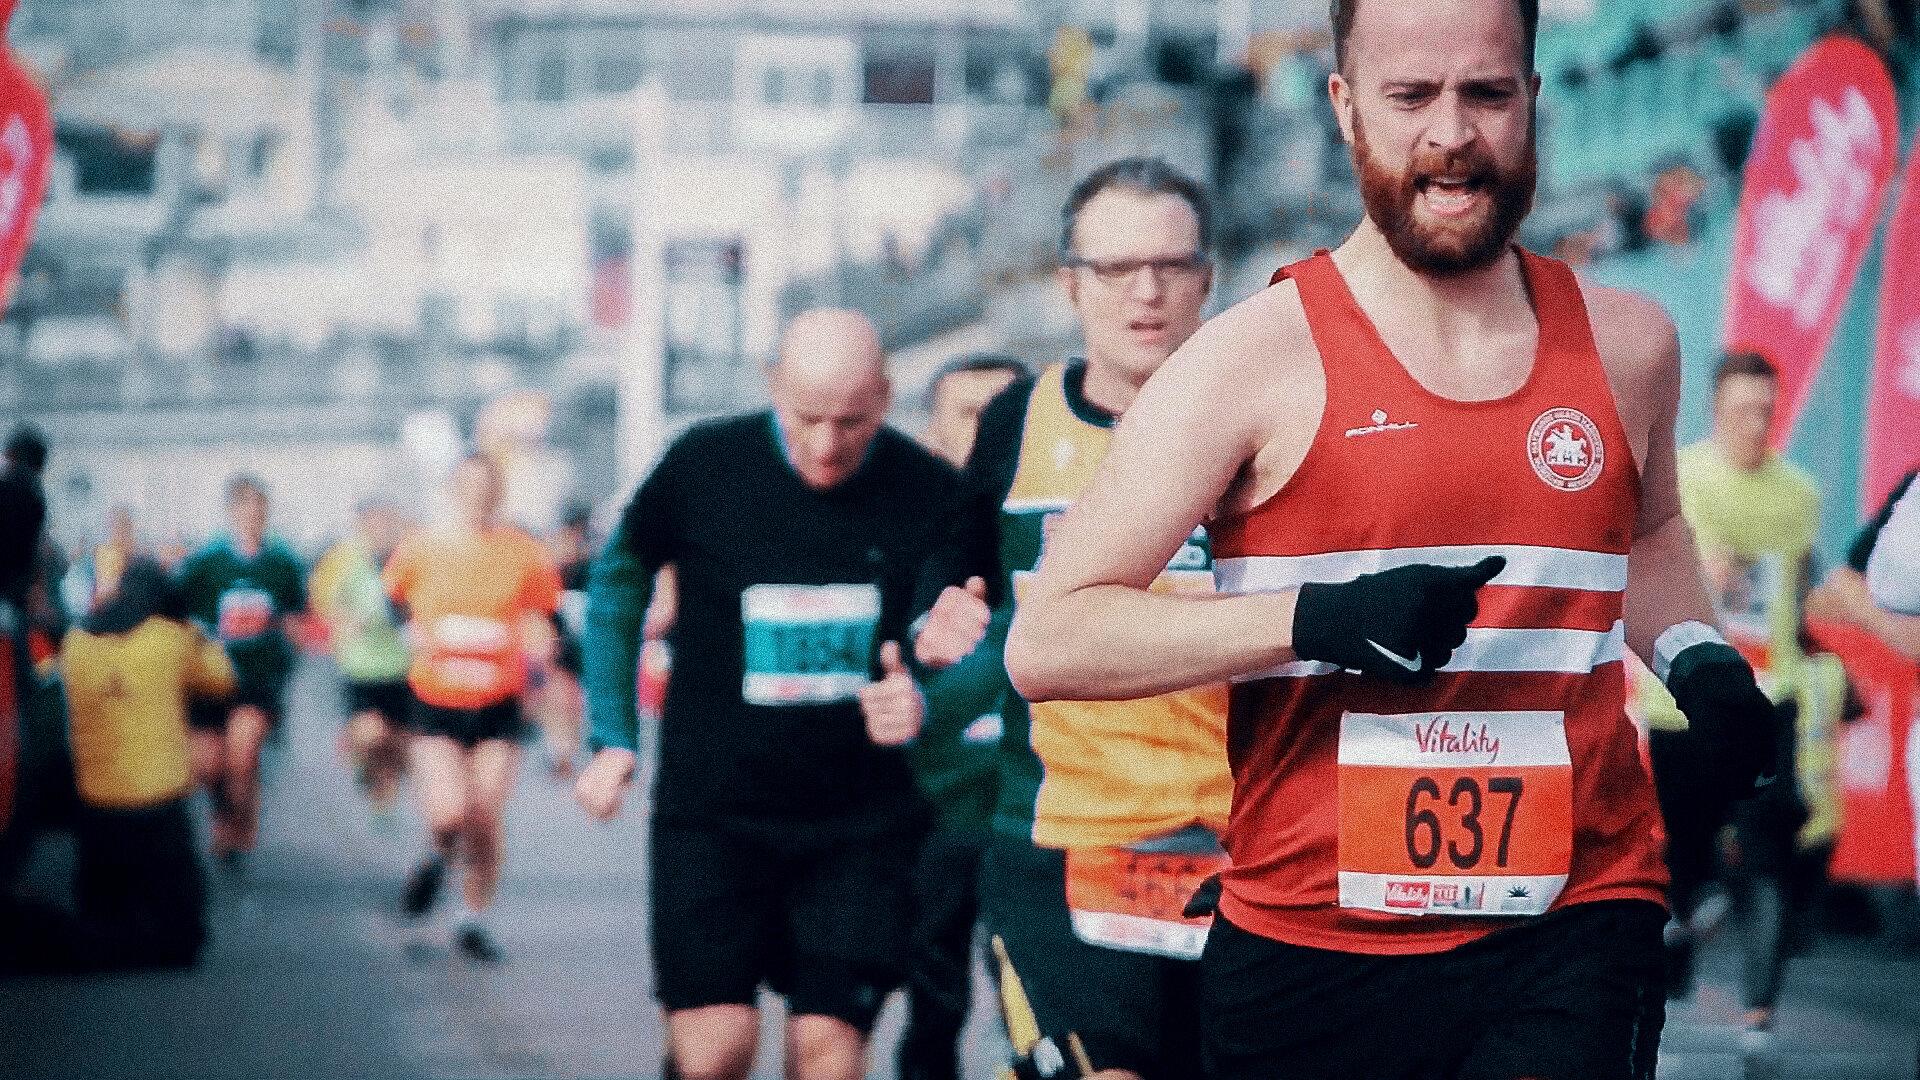 Brighton Half Marathon -